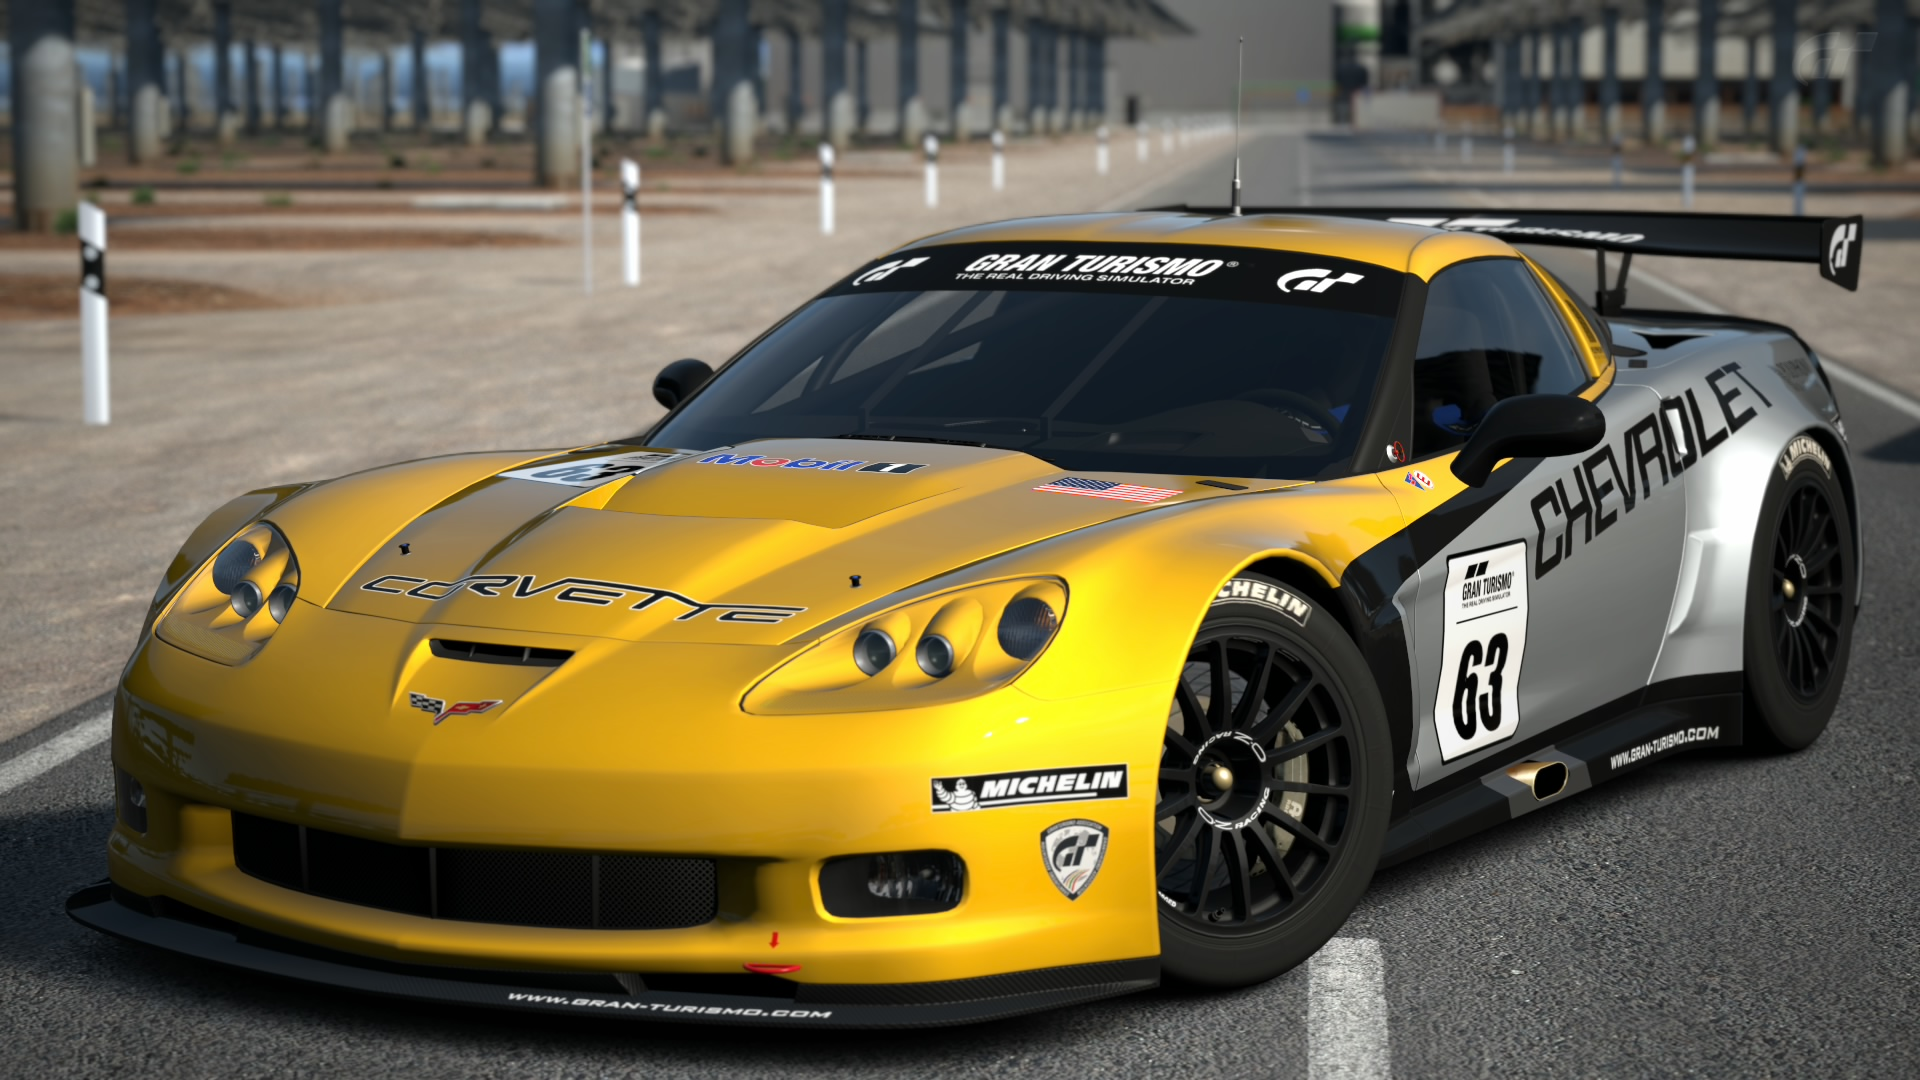 Kekurangan Chevrolet Corvette C6 Harga